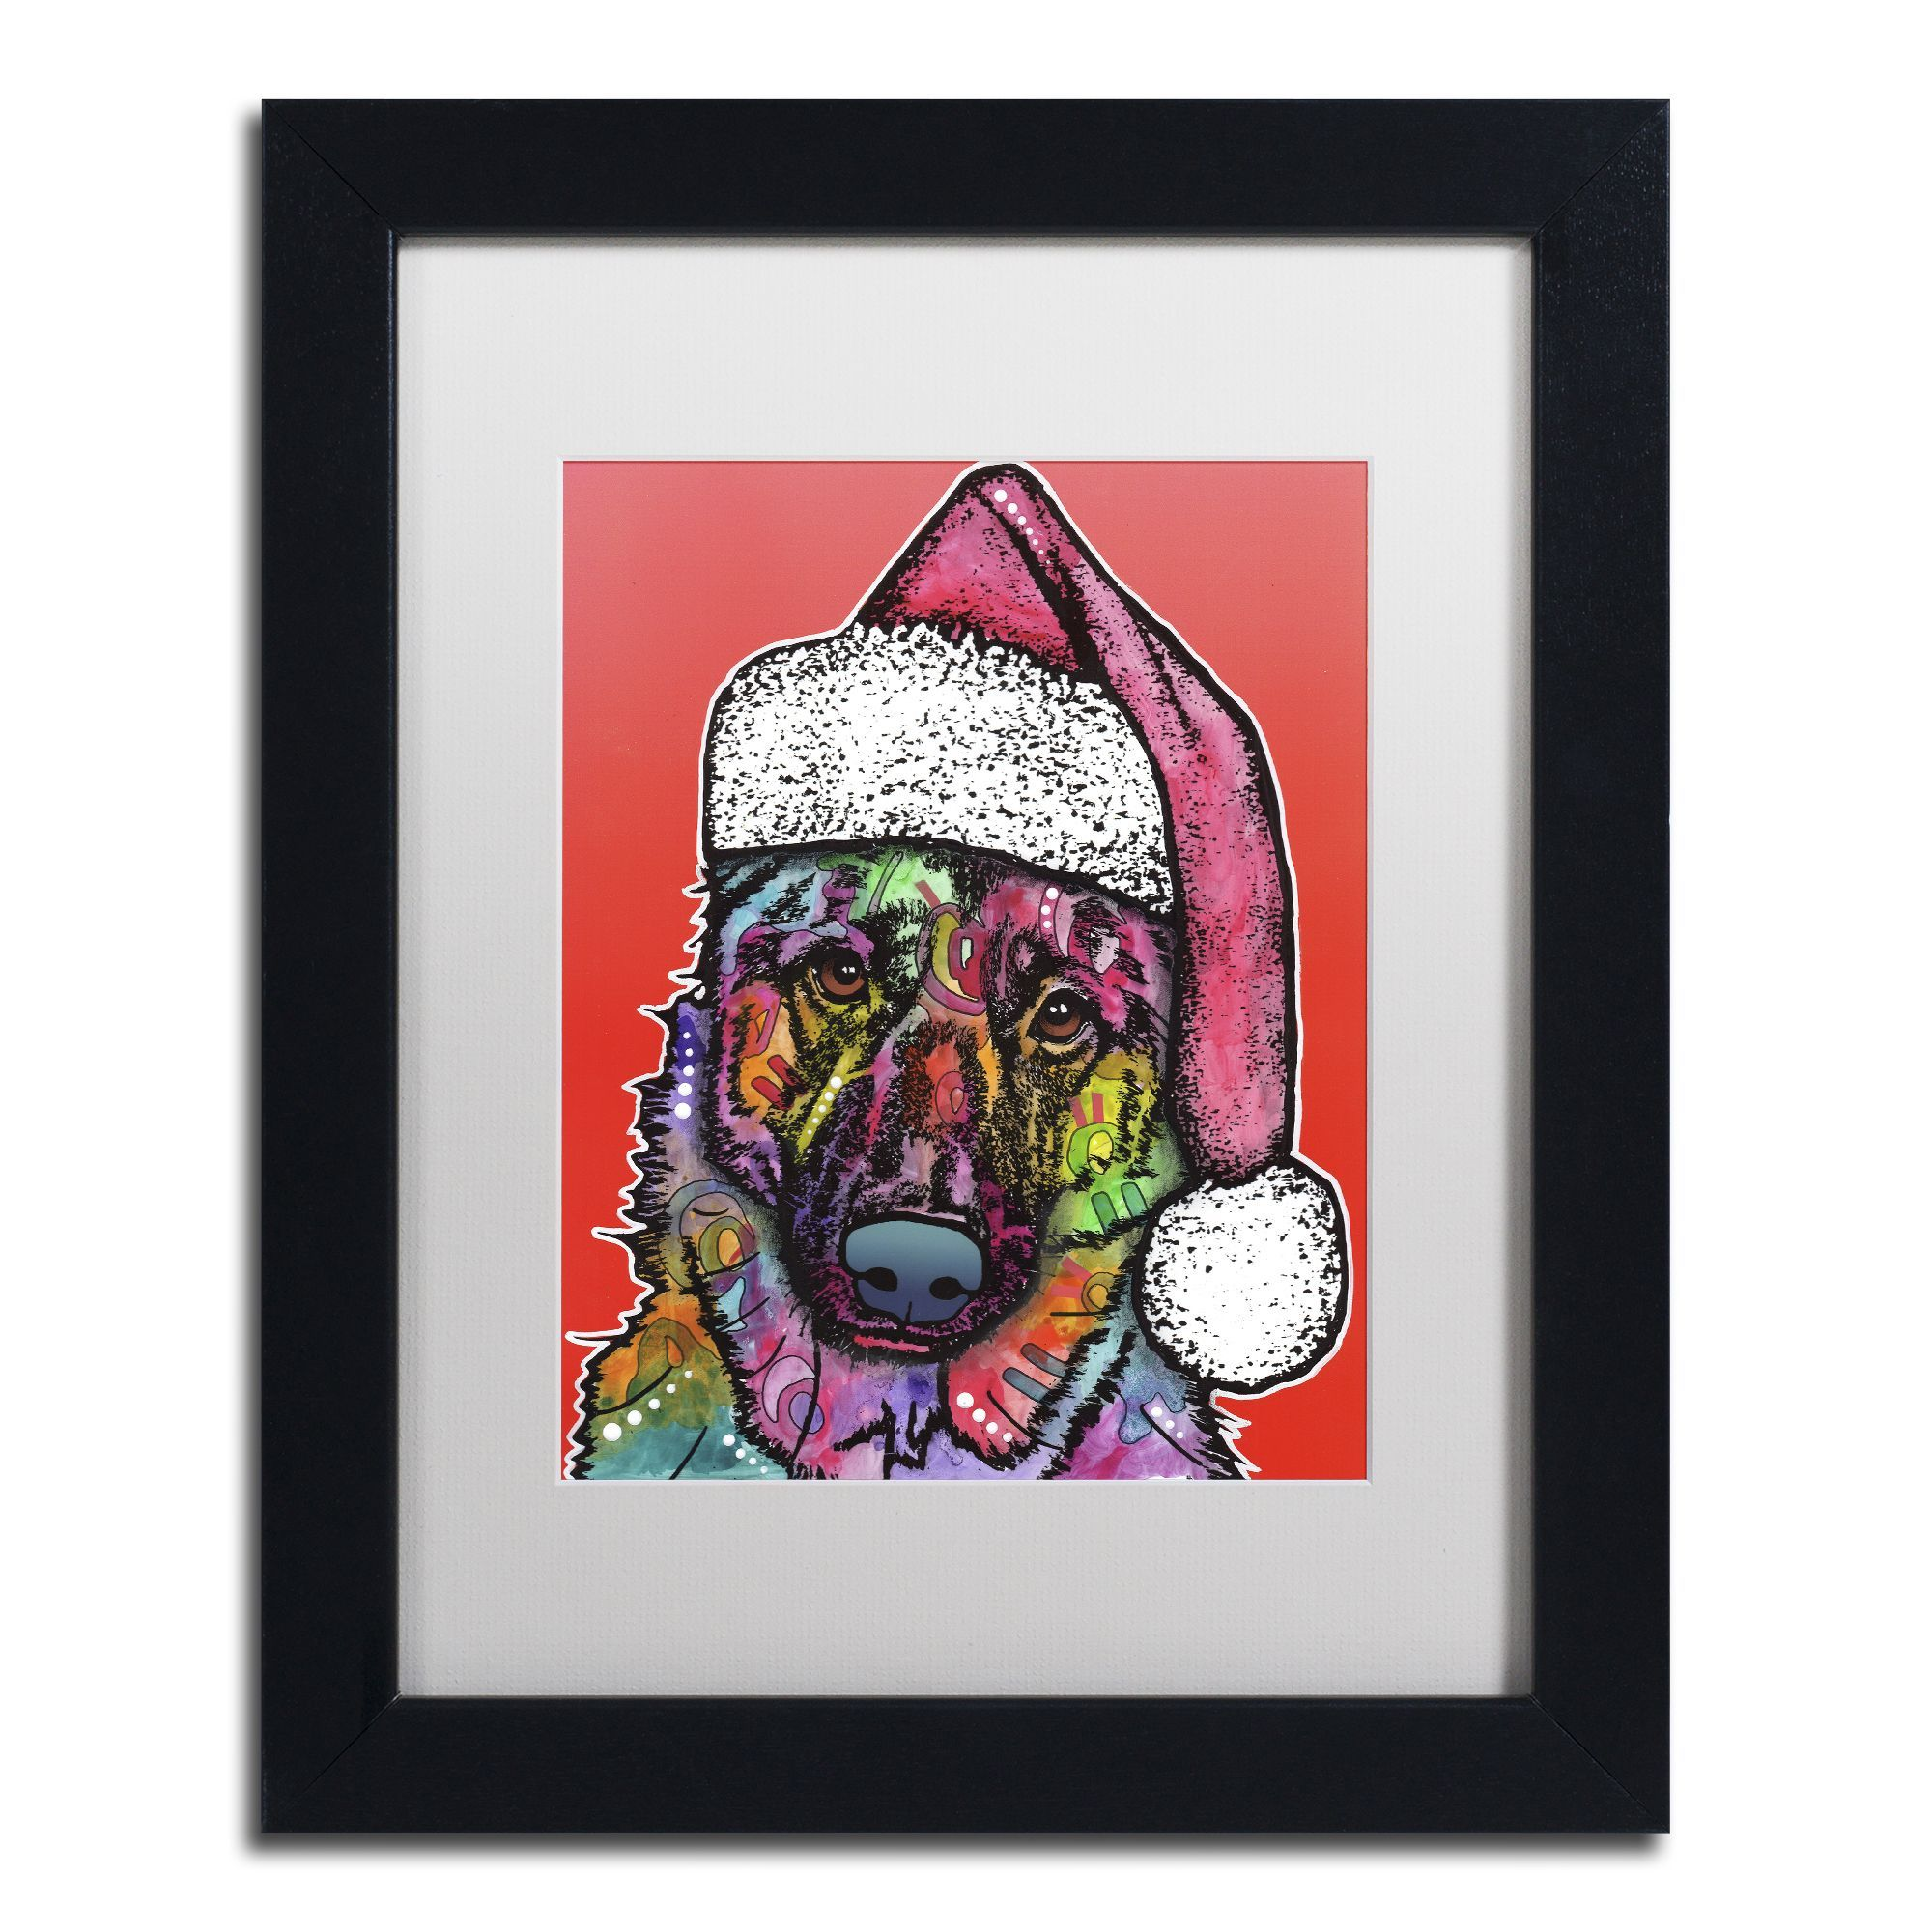 Dean Russo 'Christmas Dog' Matted Framed Art